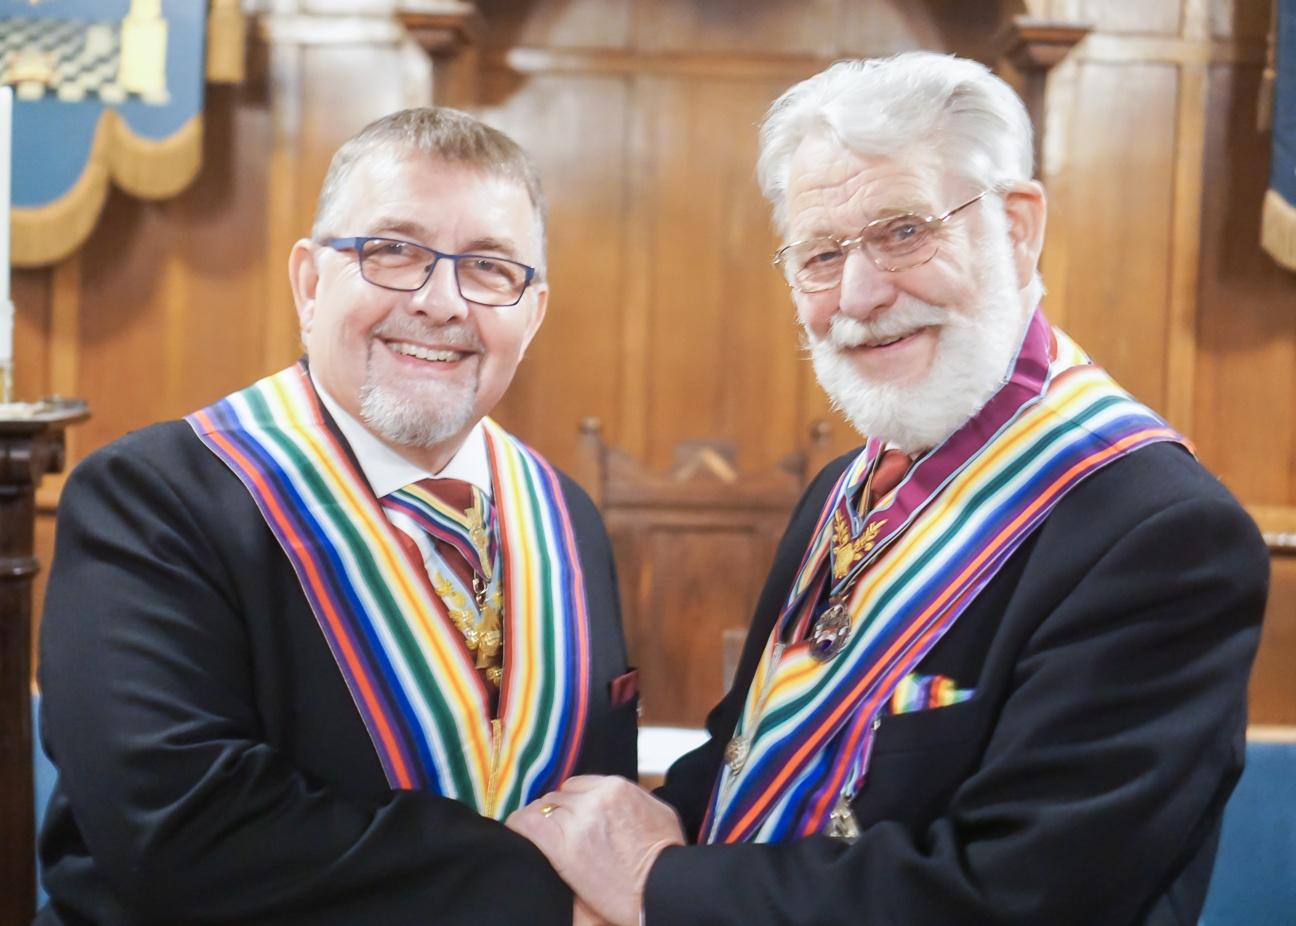 W.Bro. Brian Harrison returns home to Abbey Lodge of RAM. No.768. Friday, 29th Nov. 2019